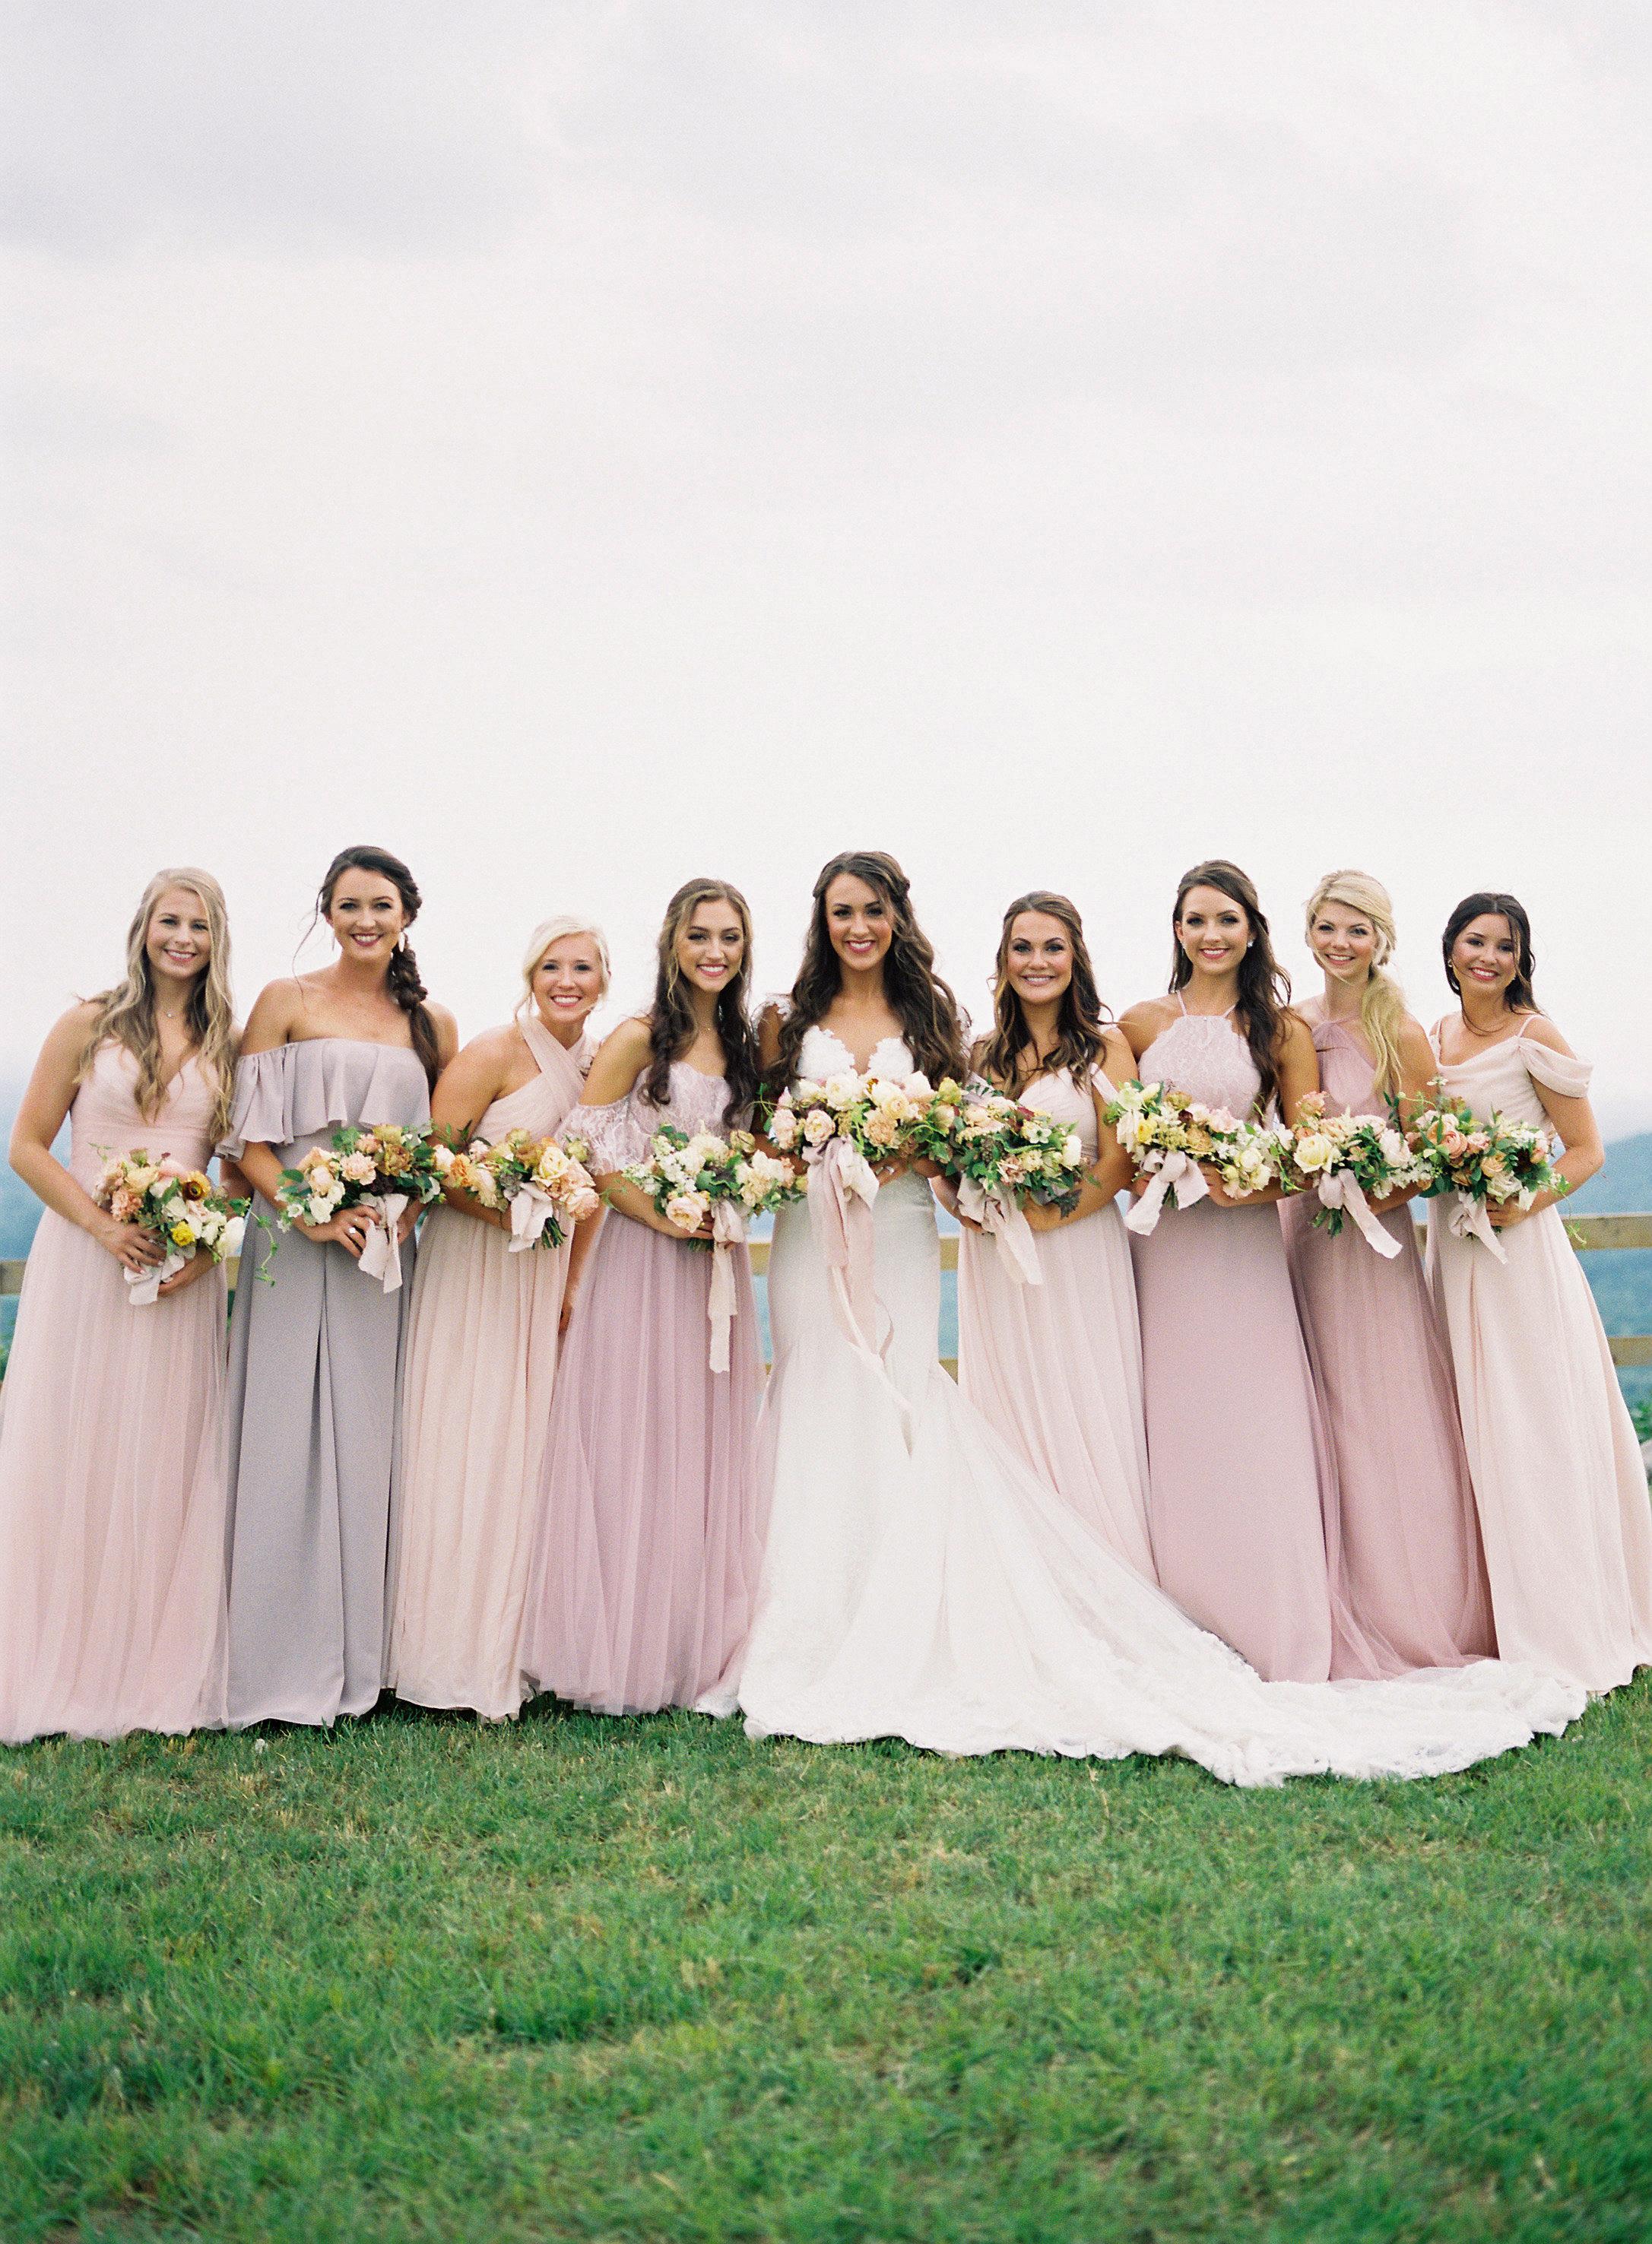 bride and bridesmaids outdoors pink shade dresses